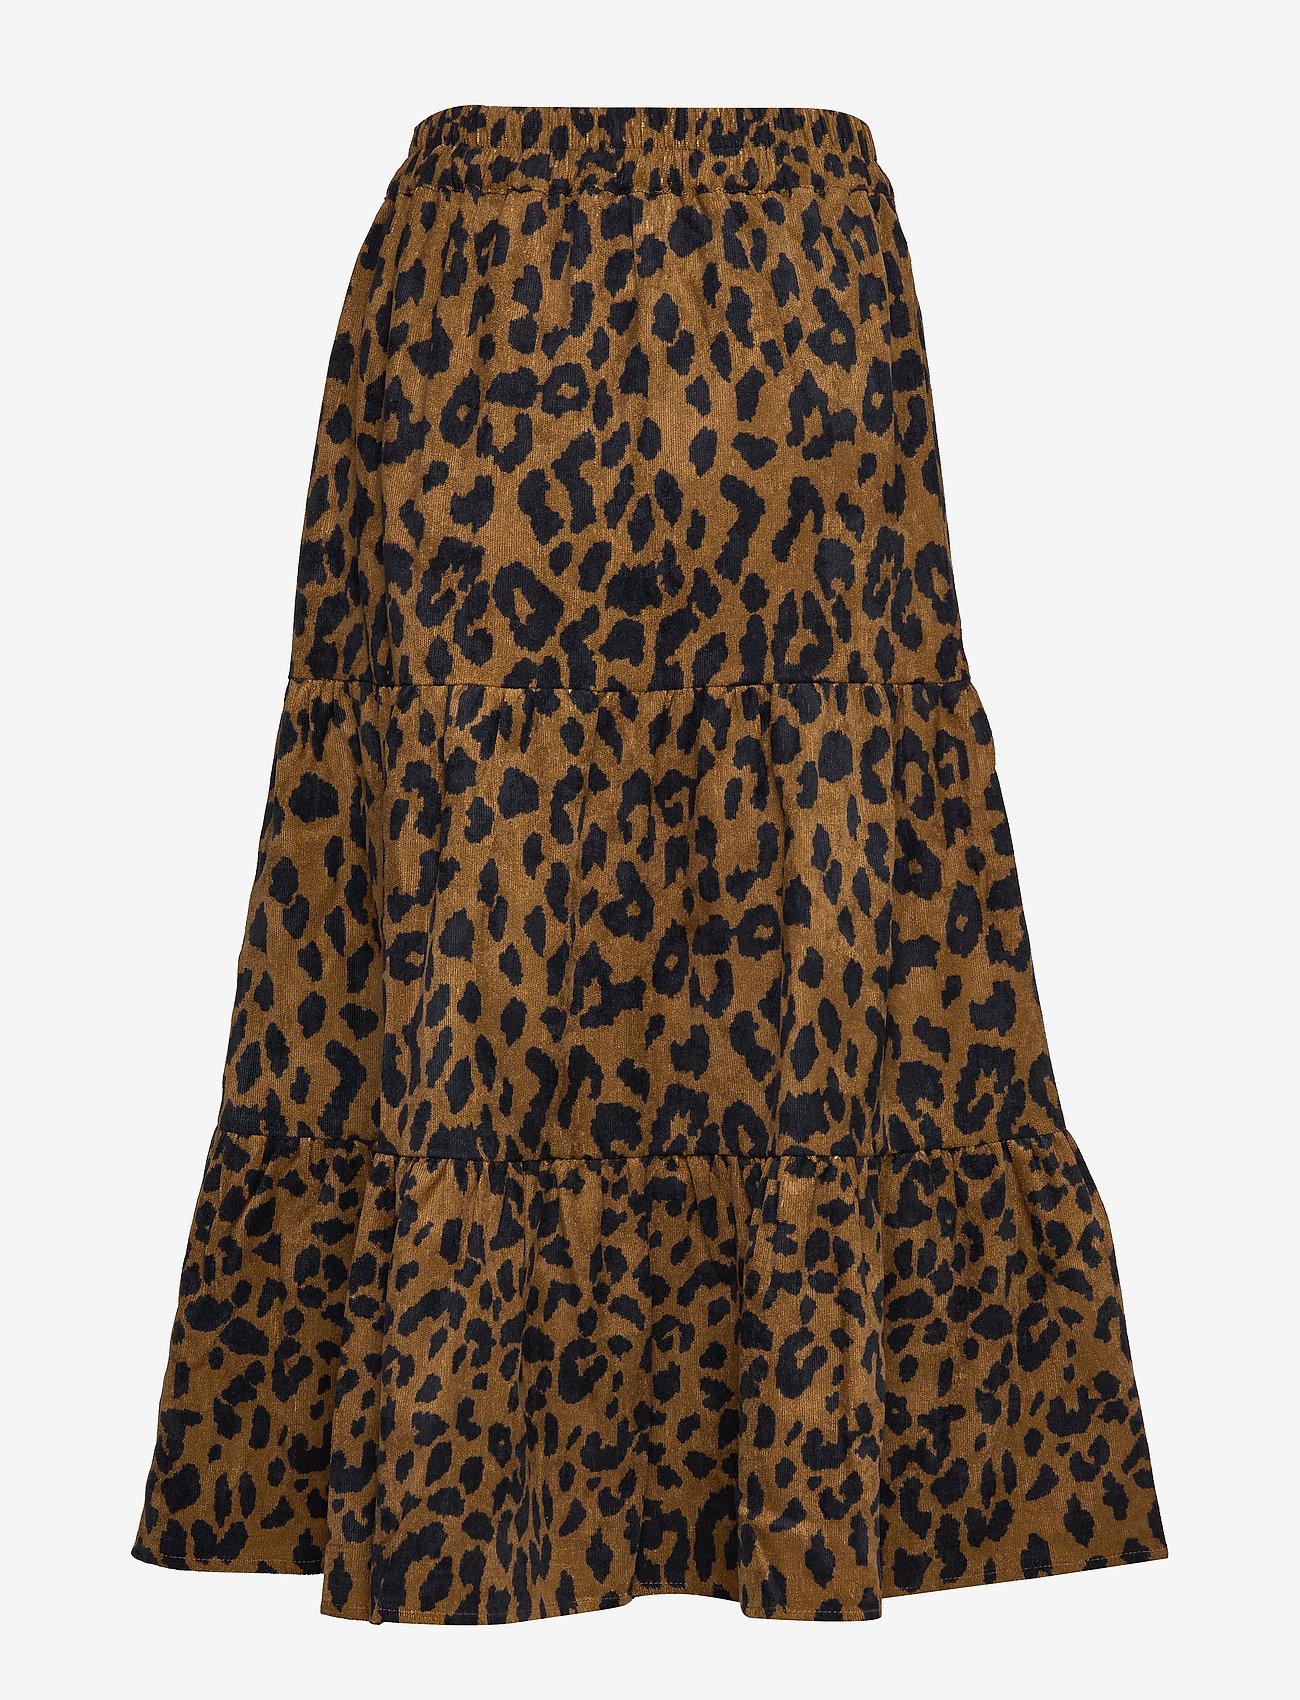 Minus - Olia skirt - midi skirts - brown leo print - 1